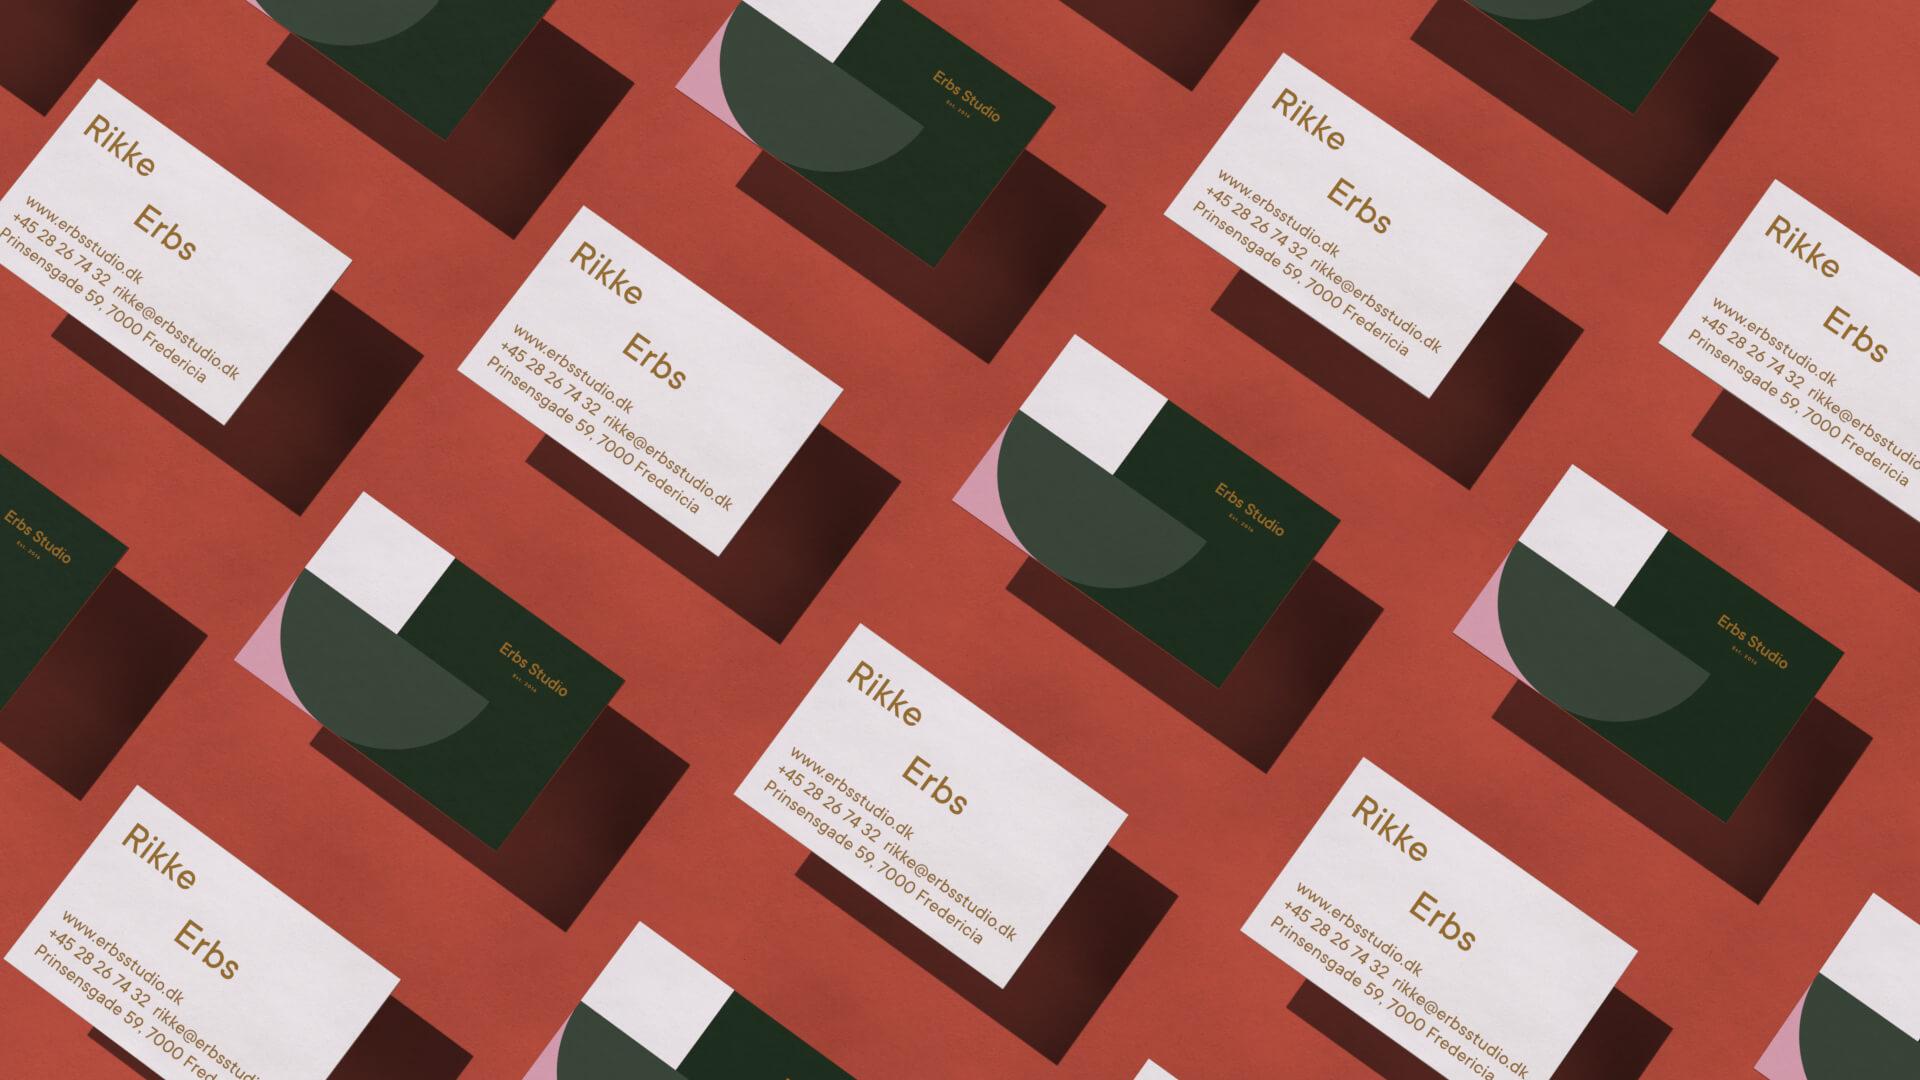 Erbs-Studio-Visuel-Identitet-Print-Visitkort-1